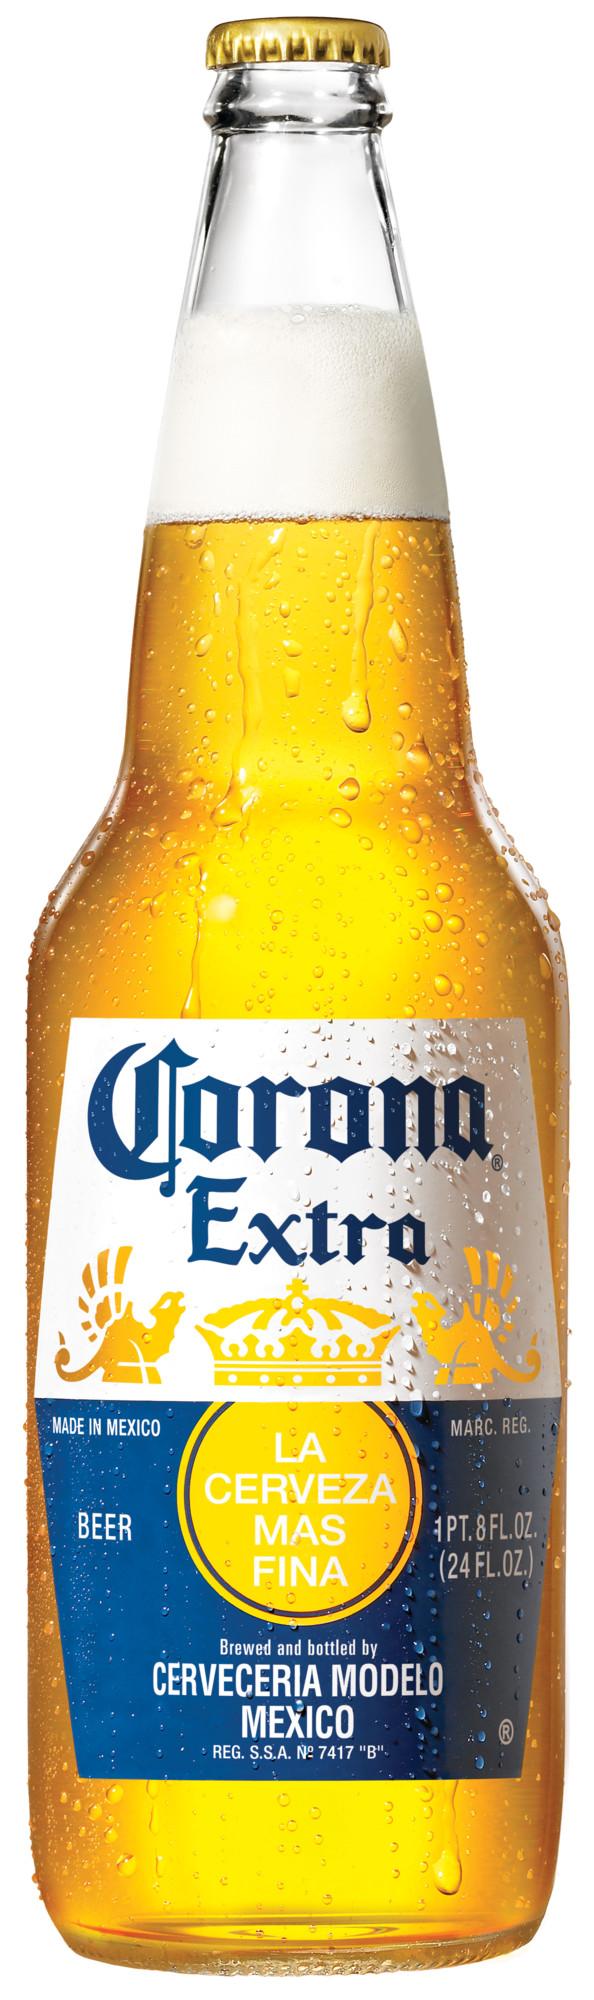 alcohol percentage in 24 oz corona extra